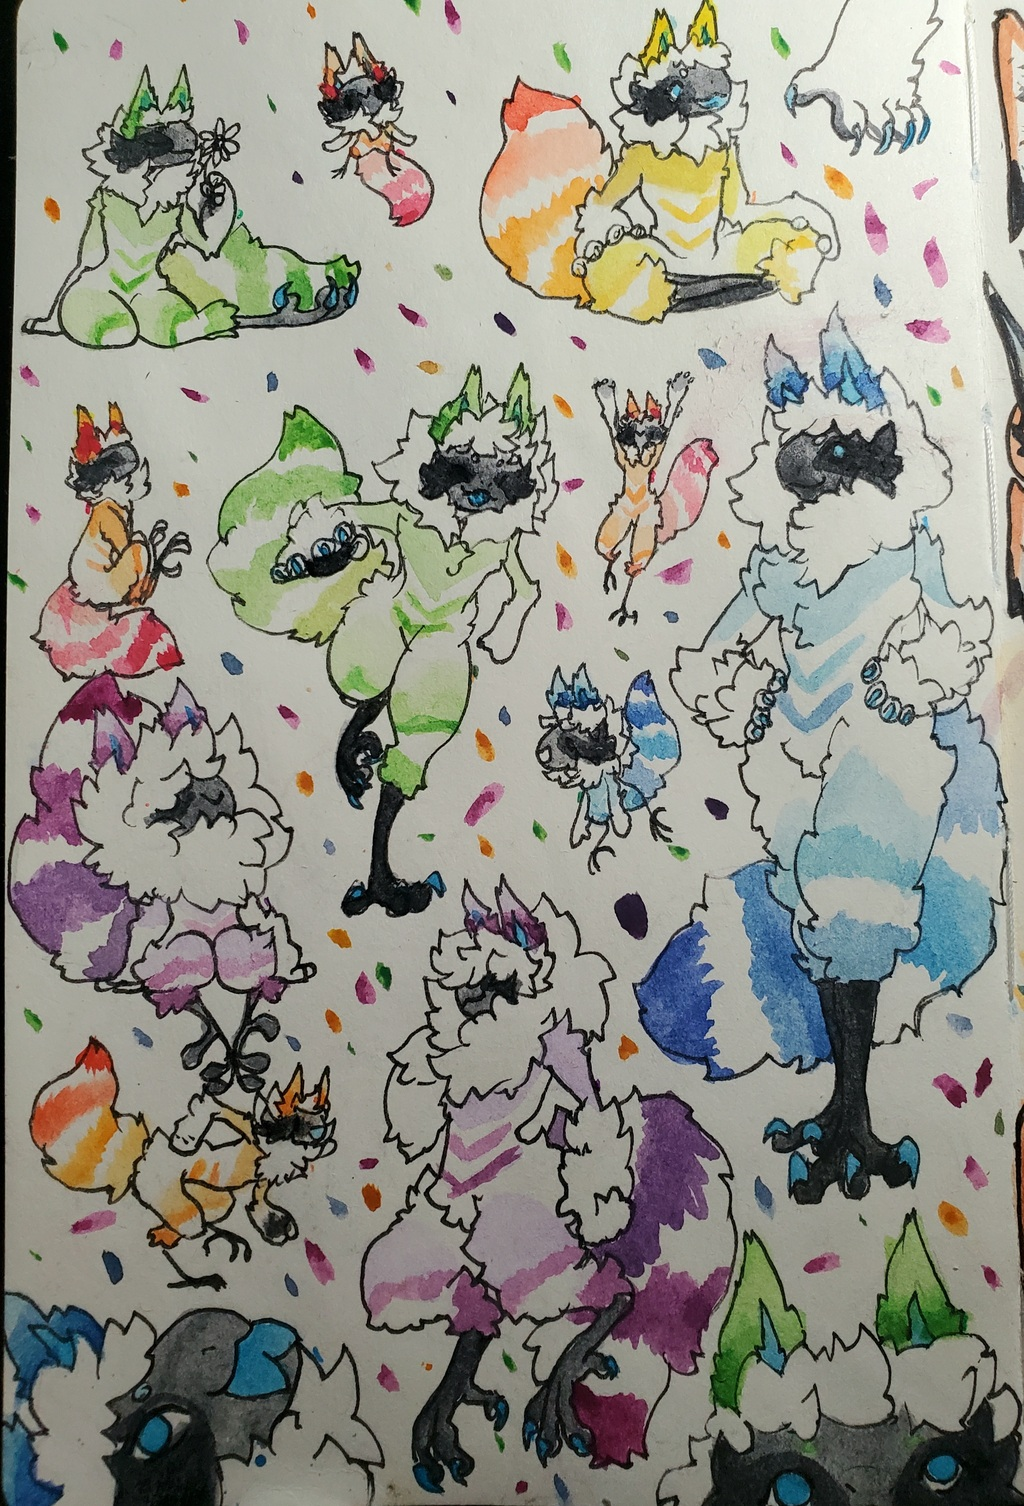 Doodle Page: Sprig